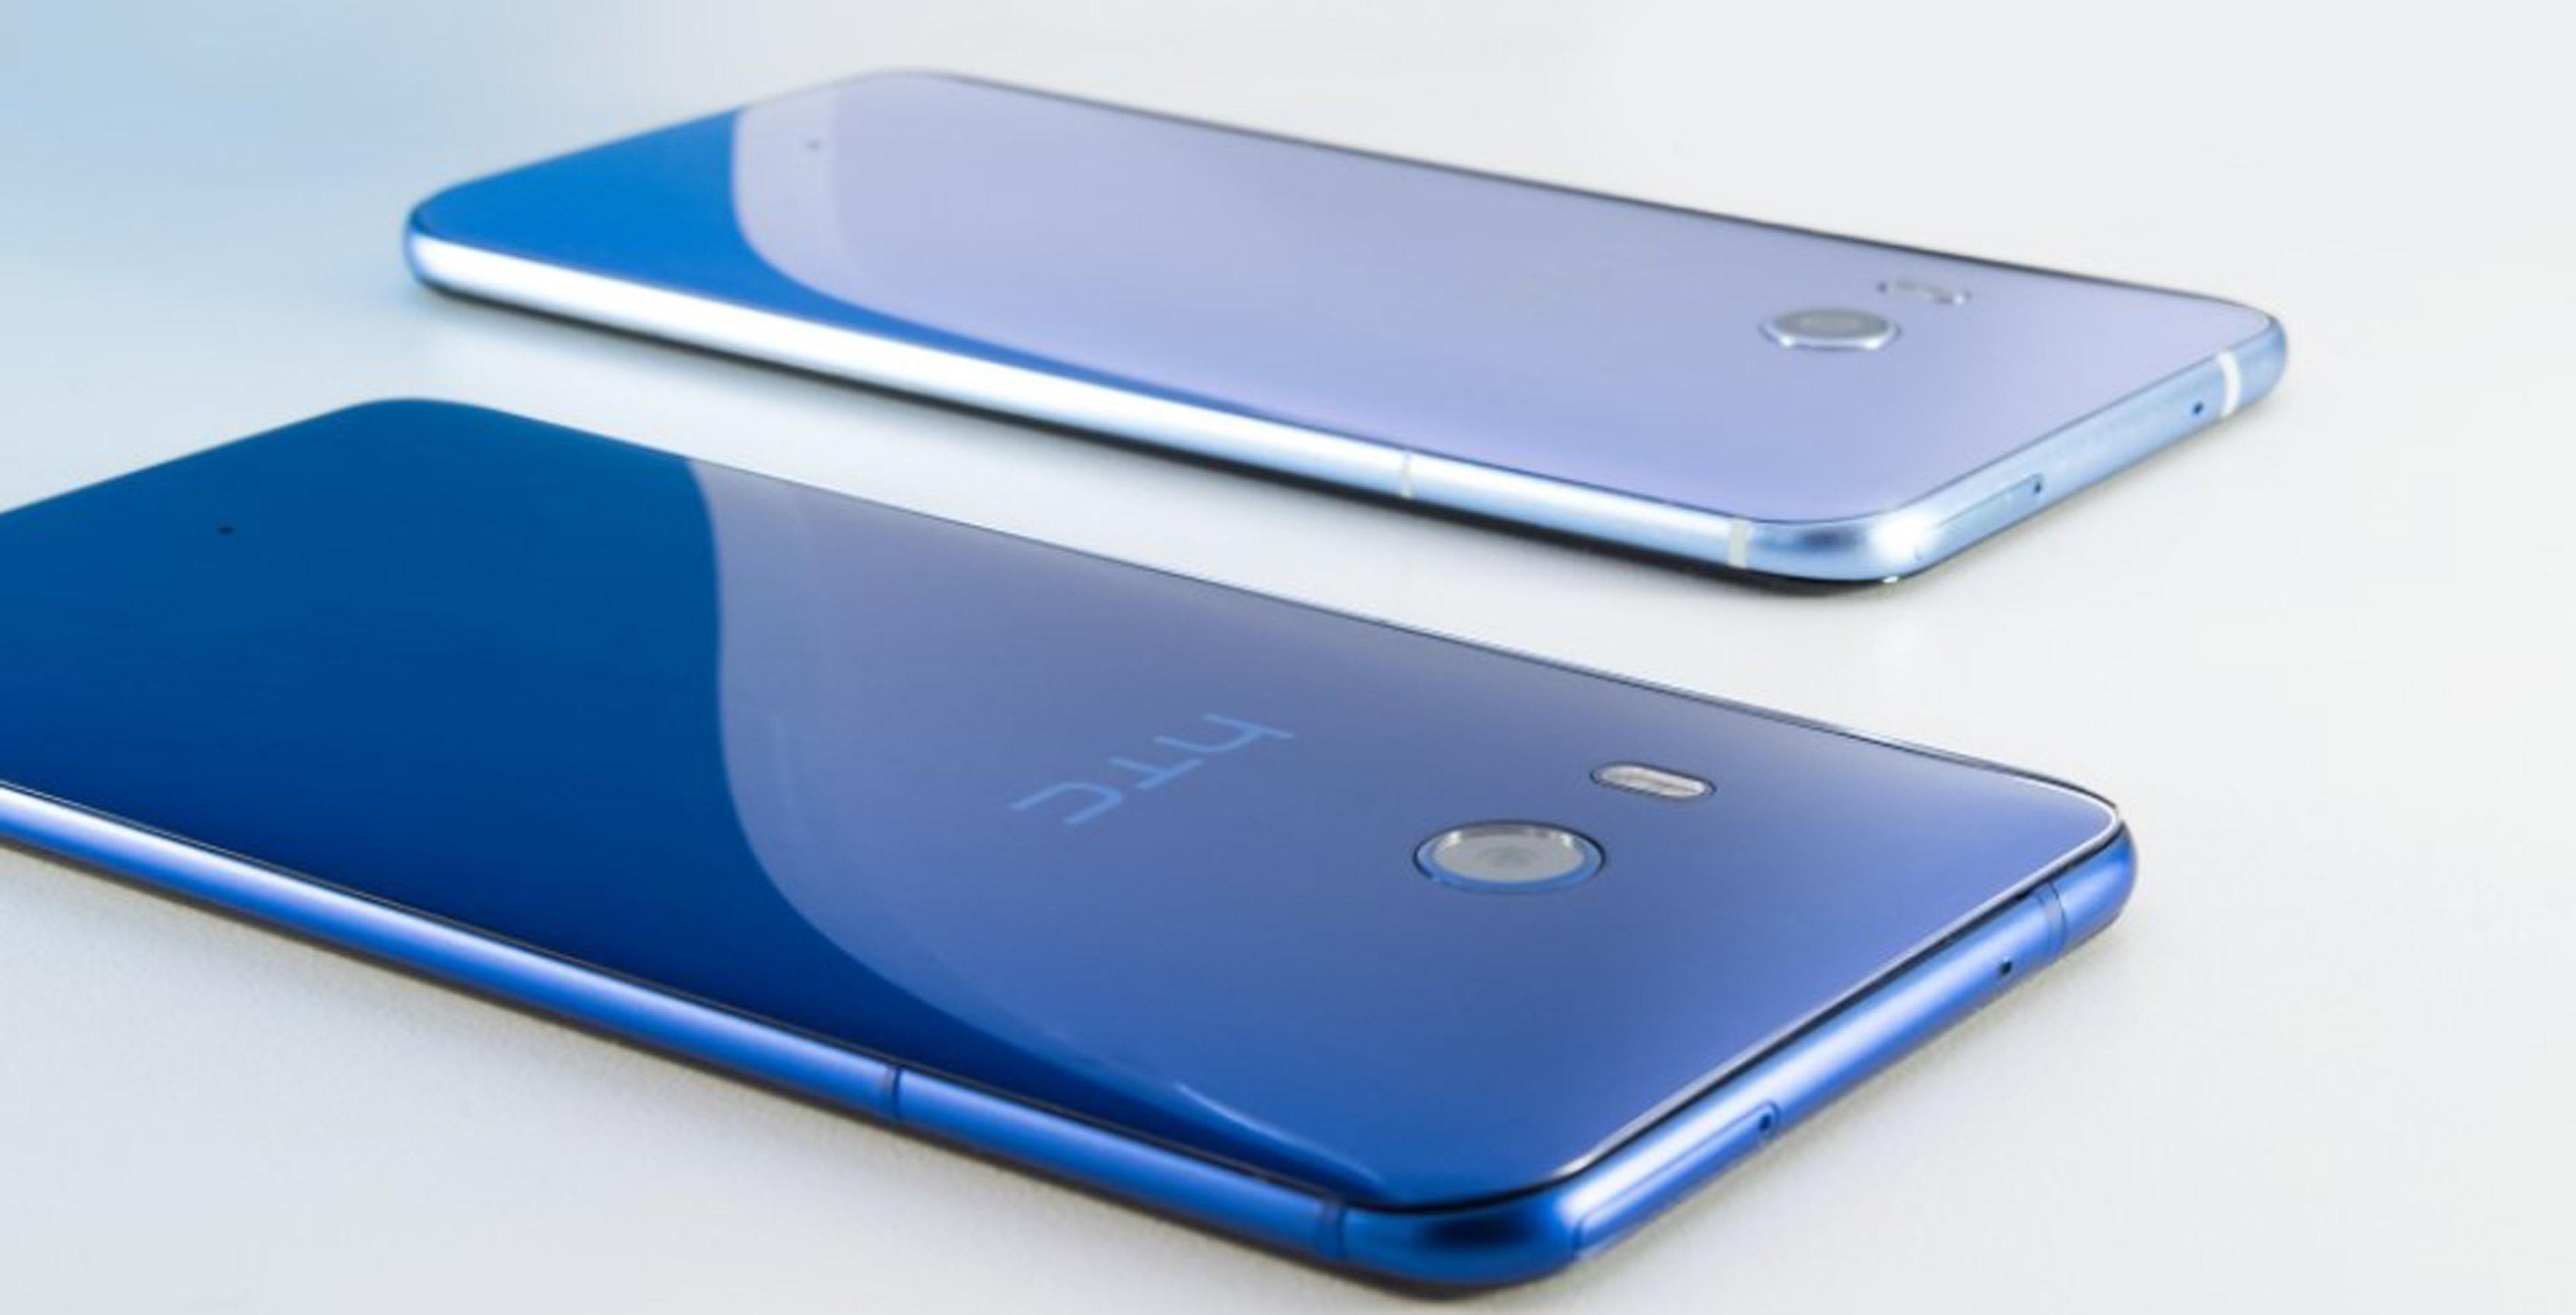 Promotional render of HTC U11 smartphone